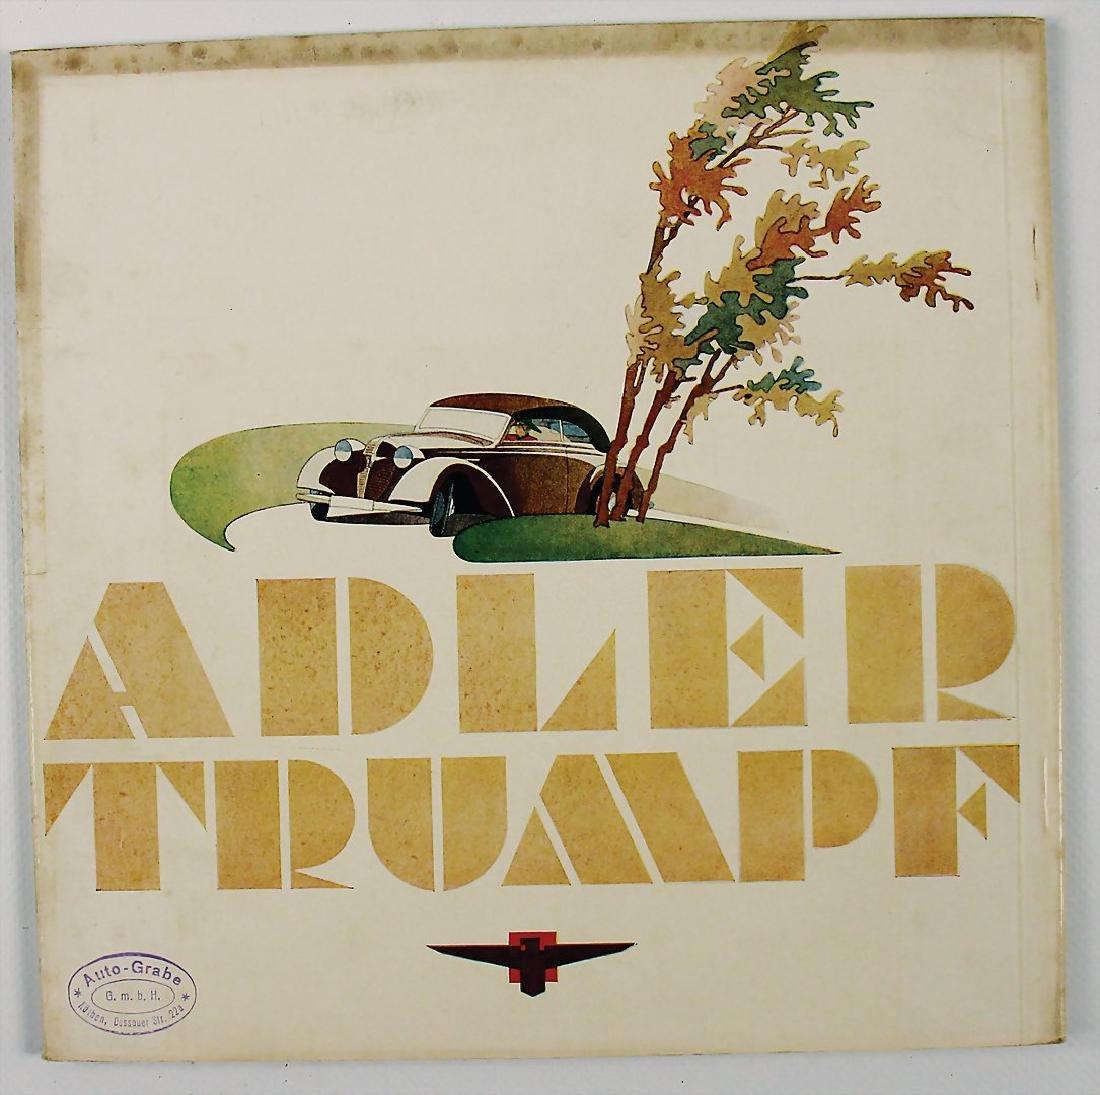 ADLER sales catalog Adler Trumpf, 16 pages, from 1937,